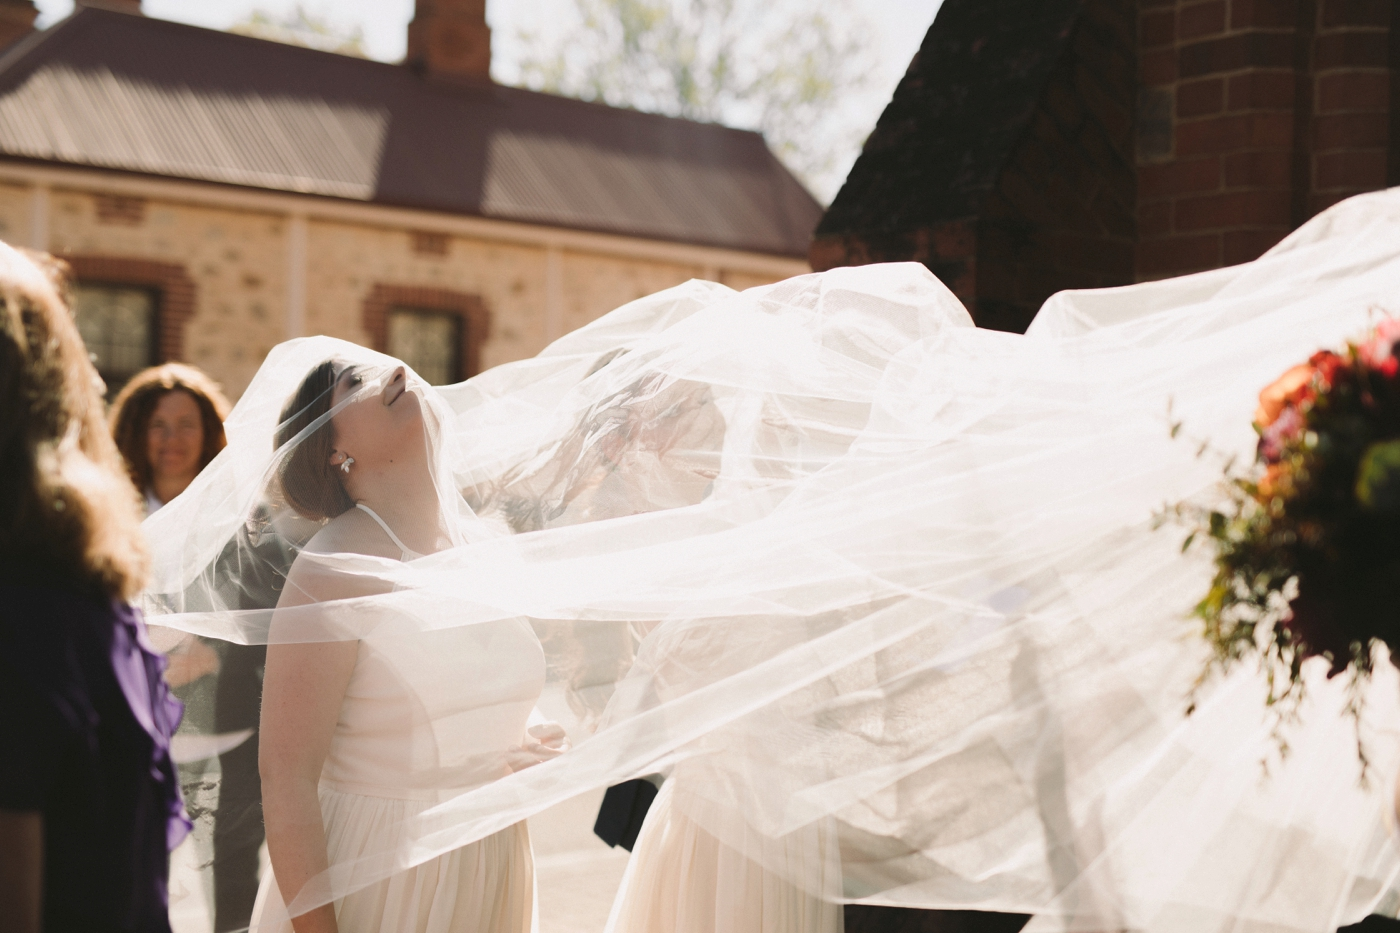 Erin & Ryan - Natural Wedding Photographer in Adelaide - Maximillians Wedding - Simple and Modern Wedding Photographer - Katherine Schultz - www.katherineschultzphotography.com_0031.jpg